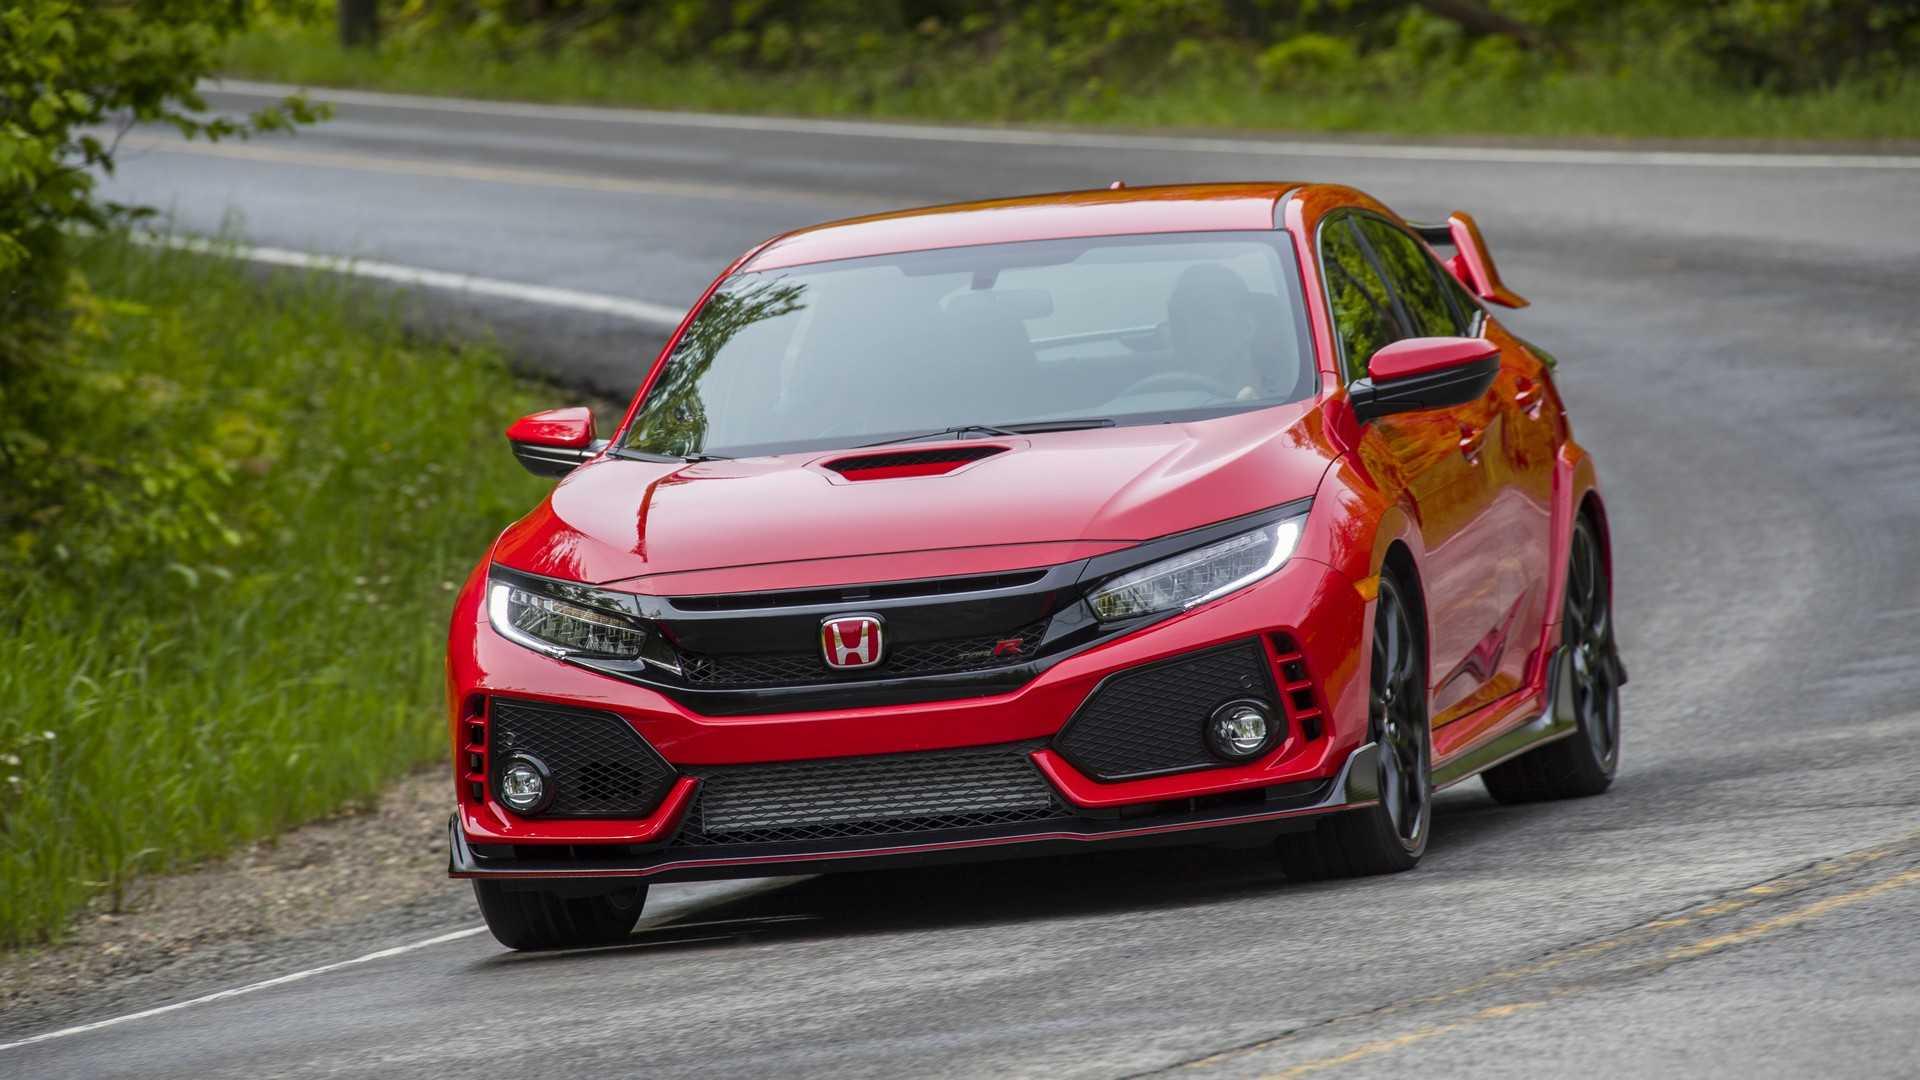 82 New 2019 Honda Civic Type R Performance for 2019 Honda Civic Type R